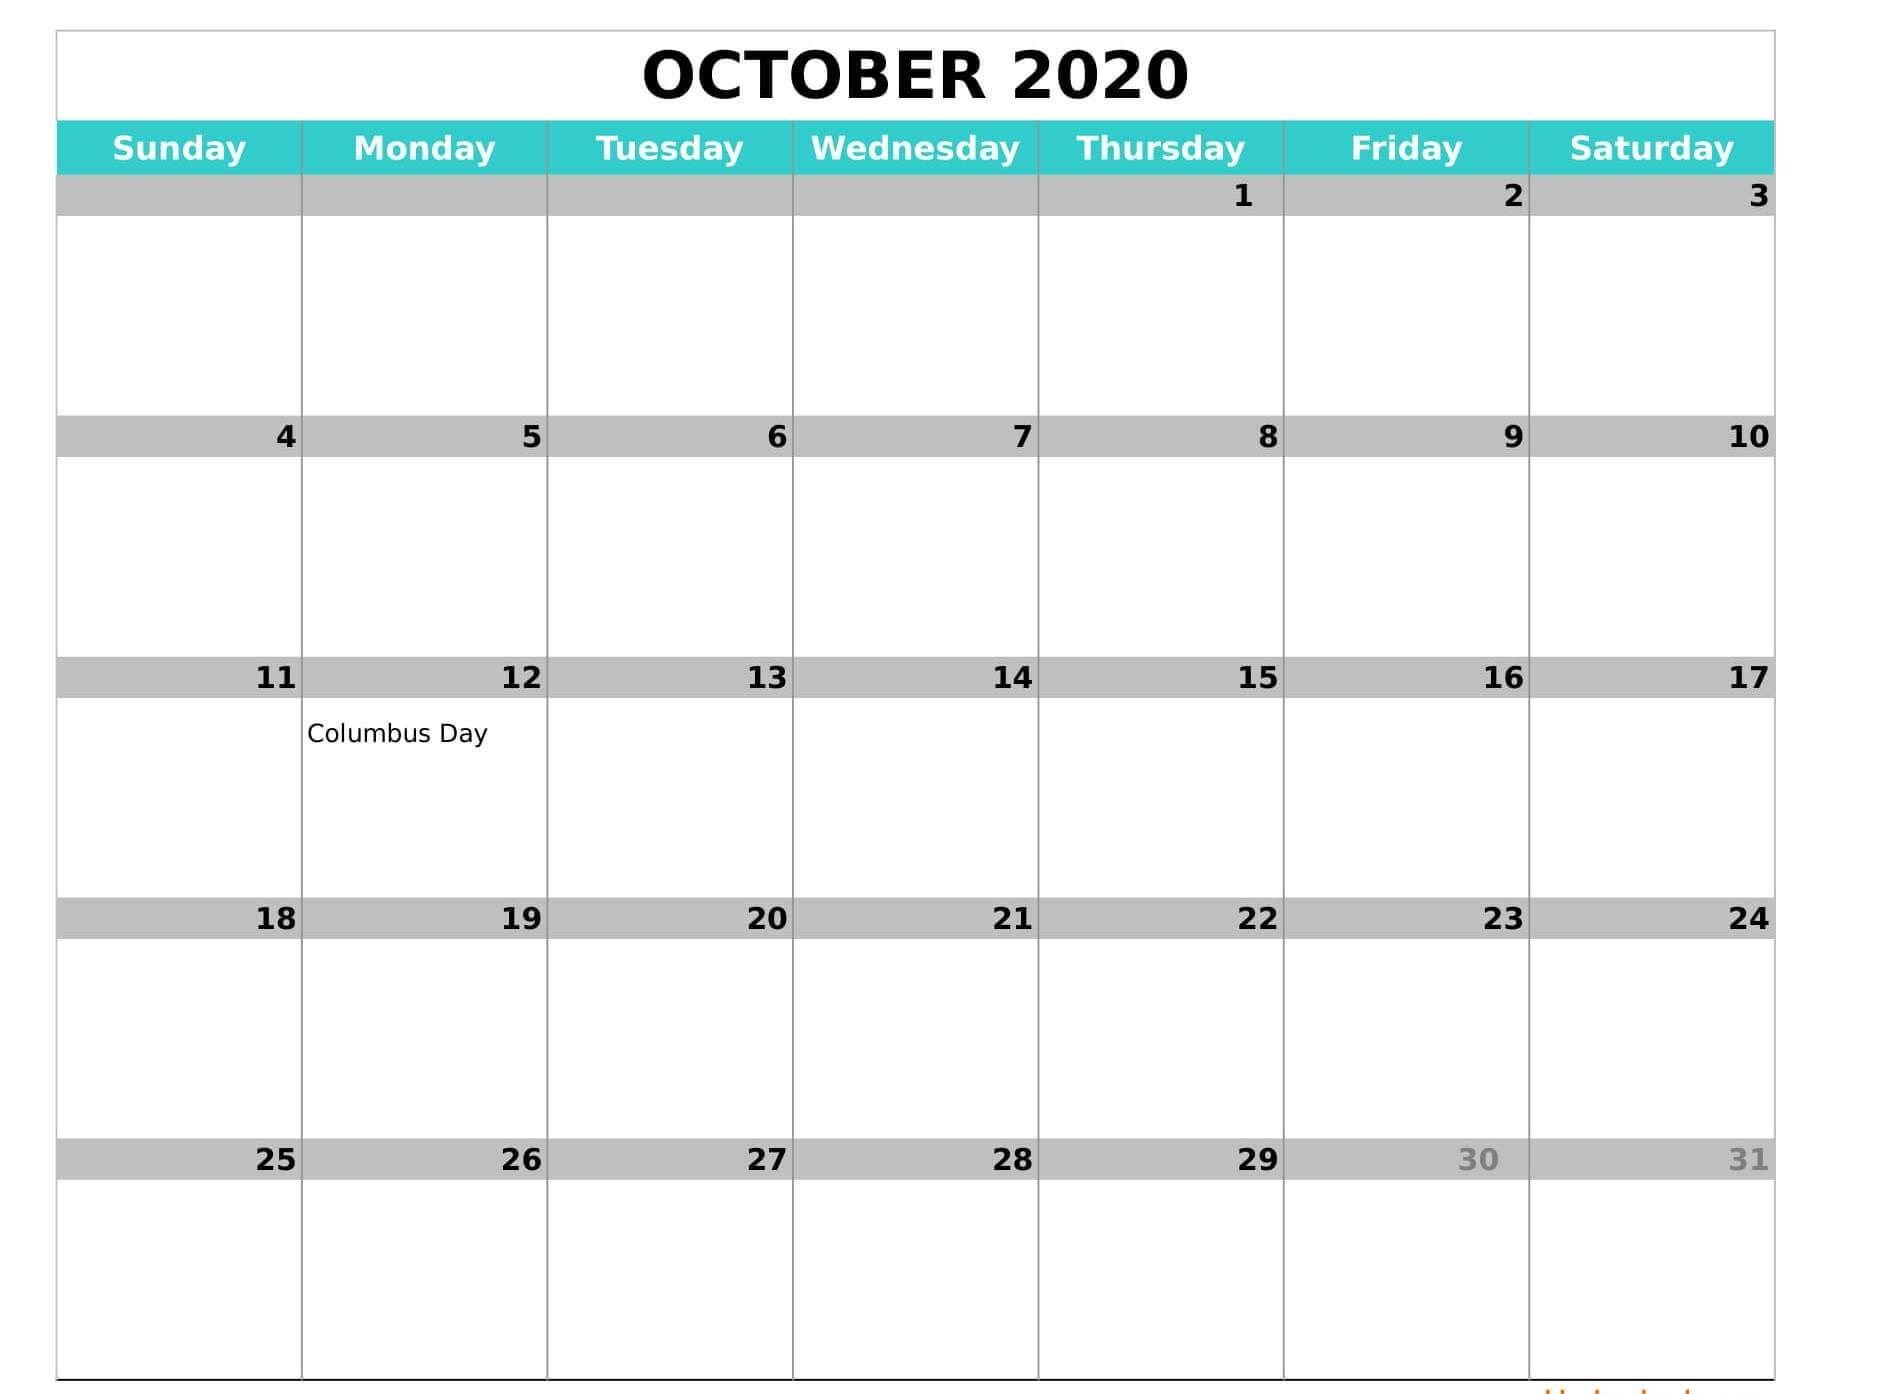 Monthly October 2020 Calendar Editable | Calendar Template 12 Month Calendar Editable Templates